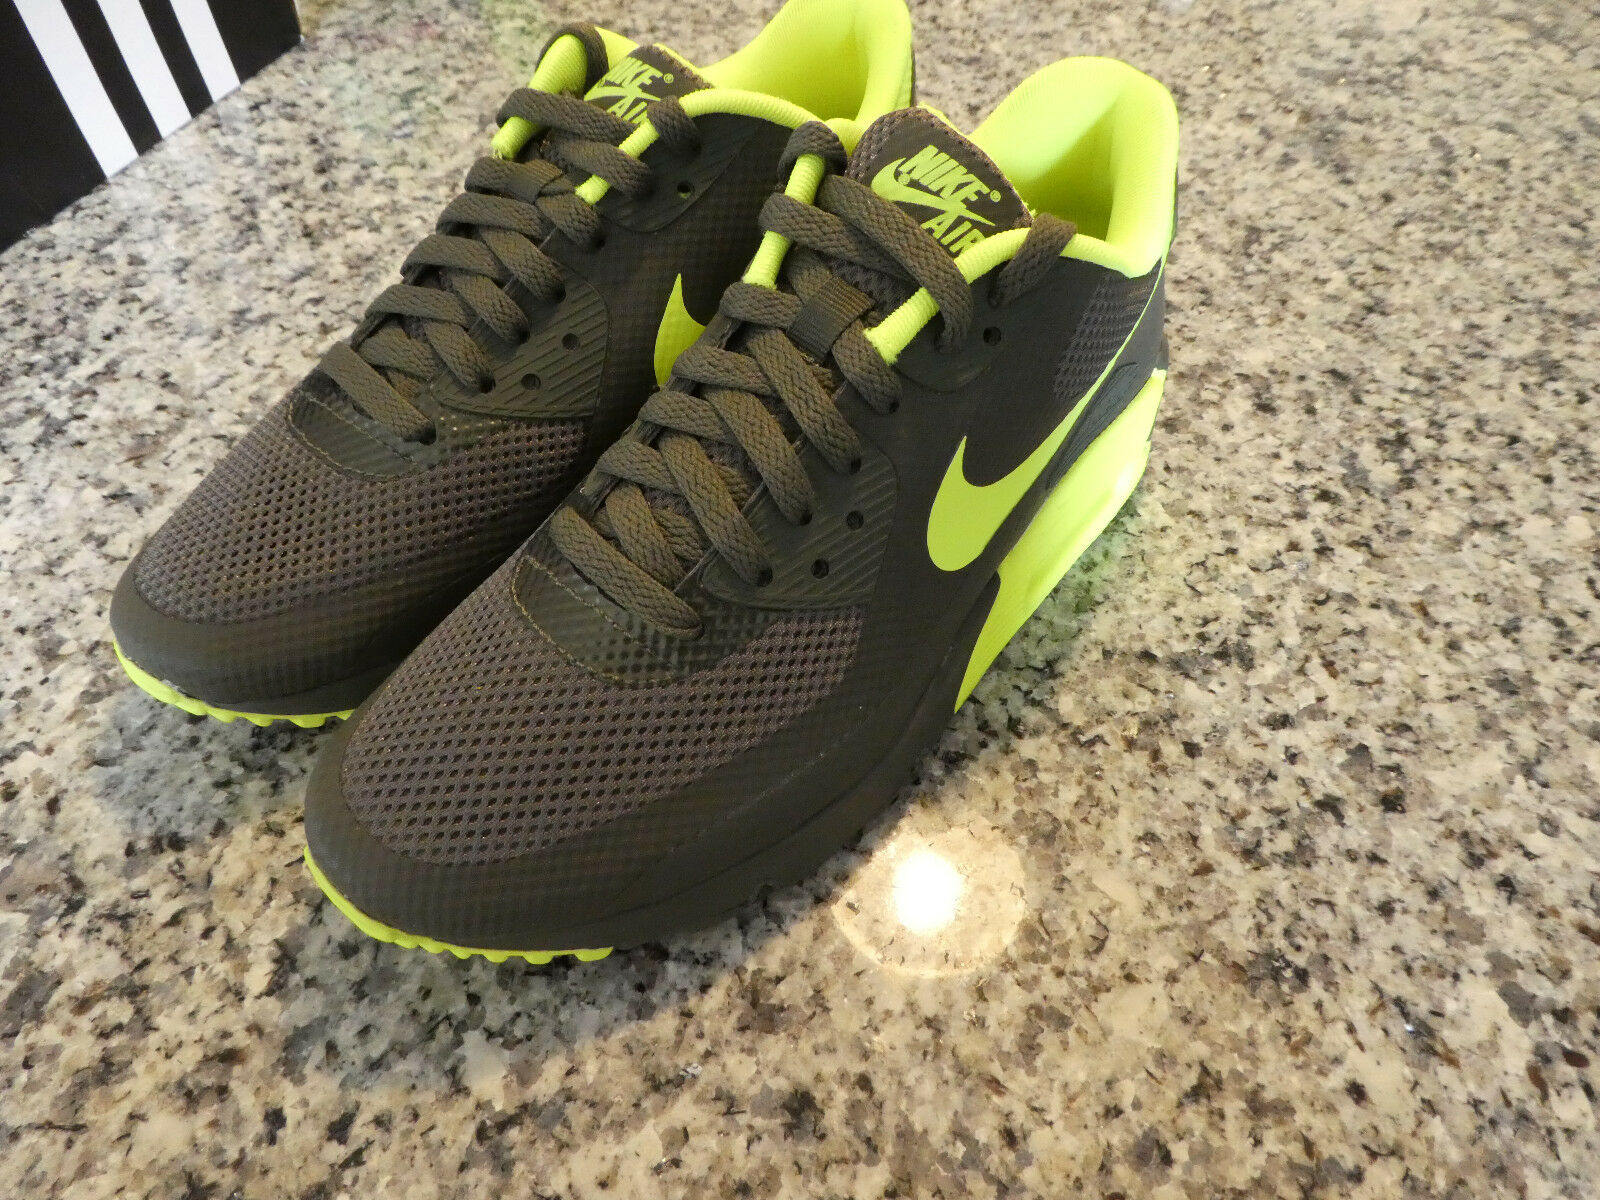 Nike Air Max 90 HYP PRM mens shoes new 454446 370